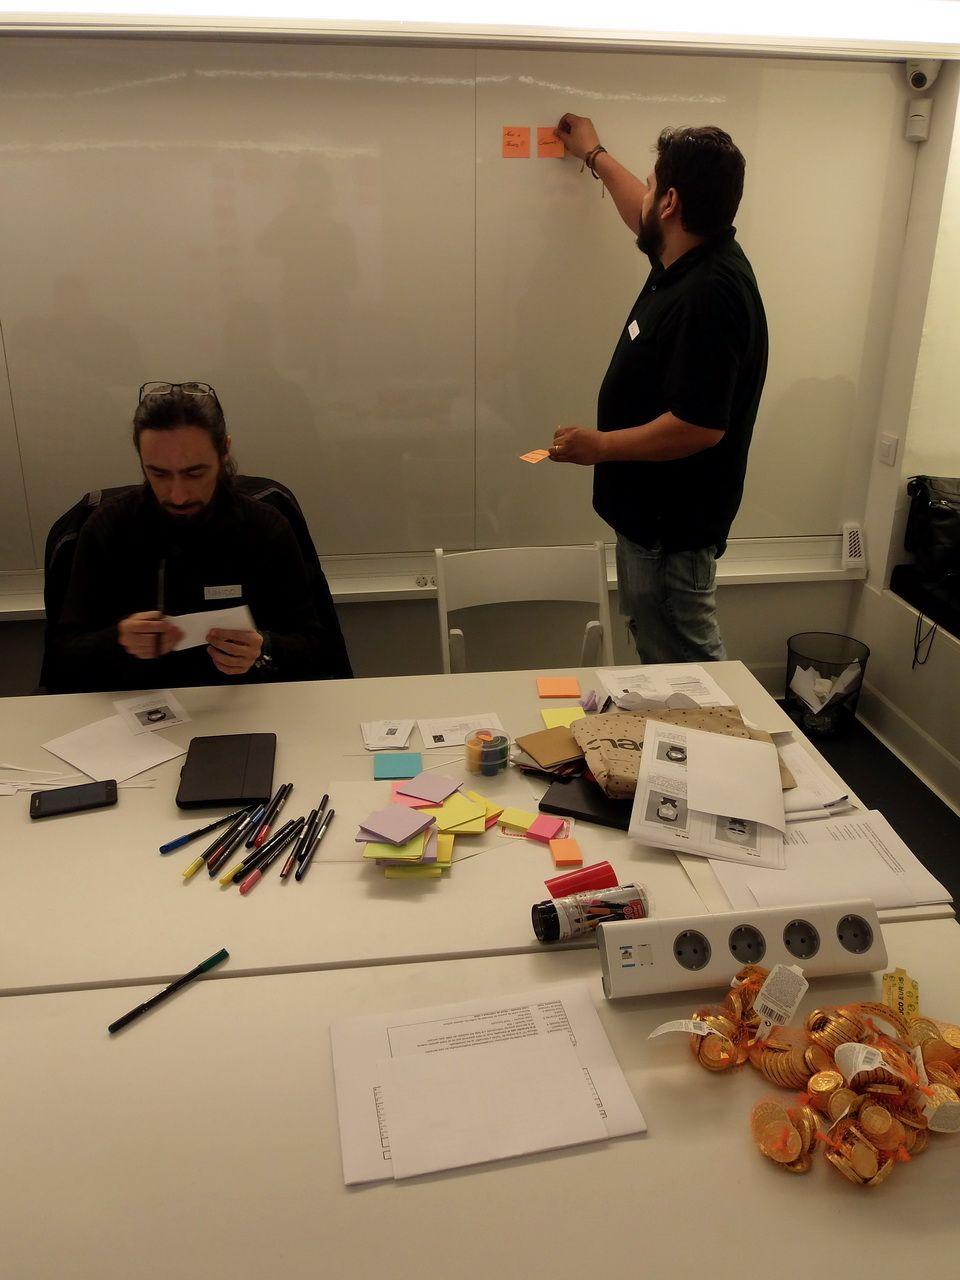 Fomentando el pensamiento creativo a través de las métaforas em Start2Bee